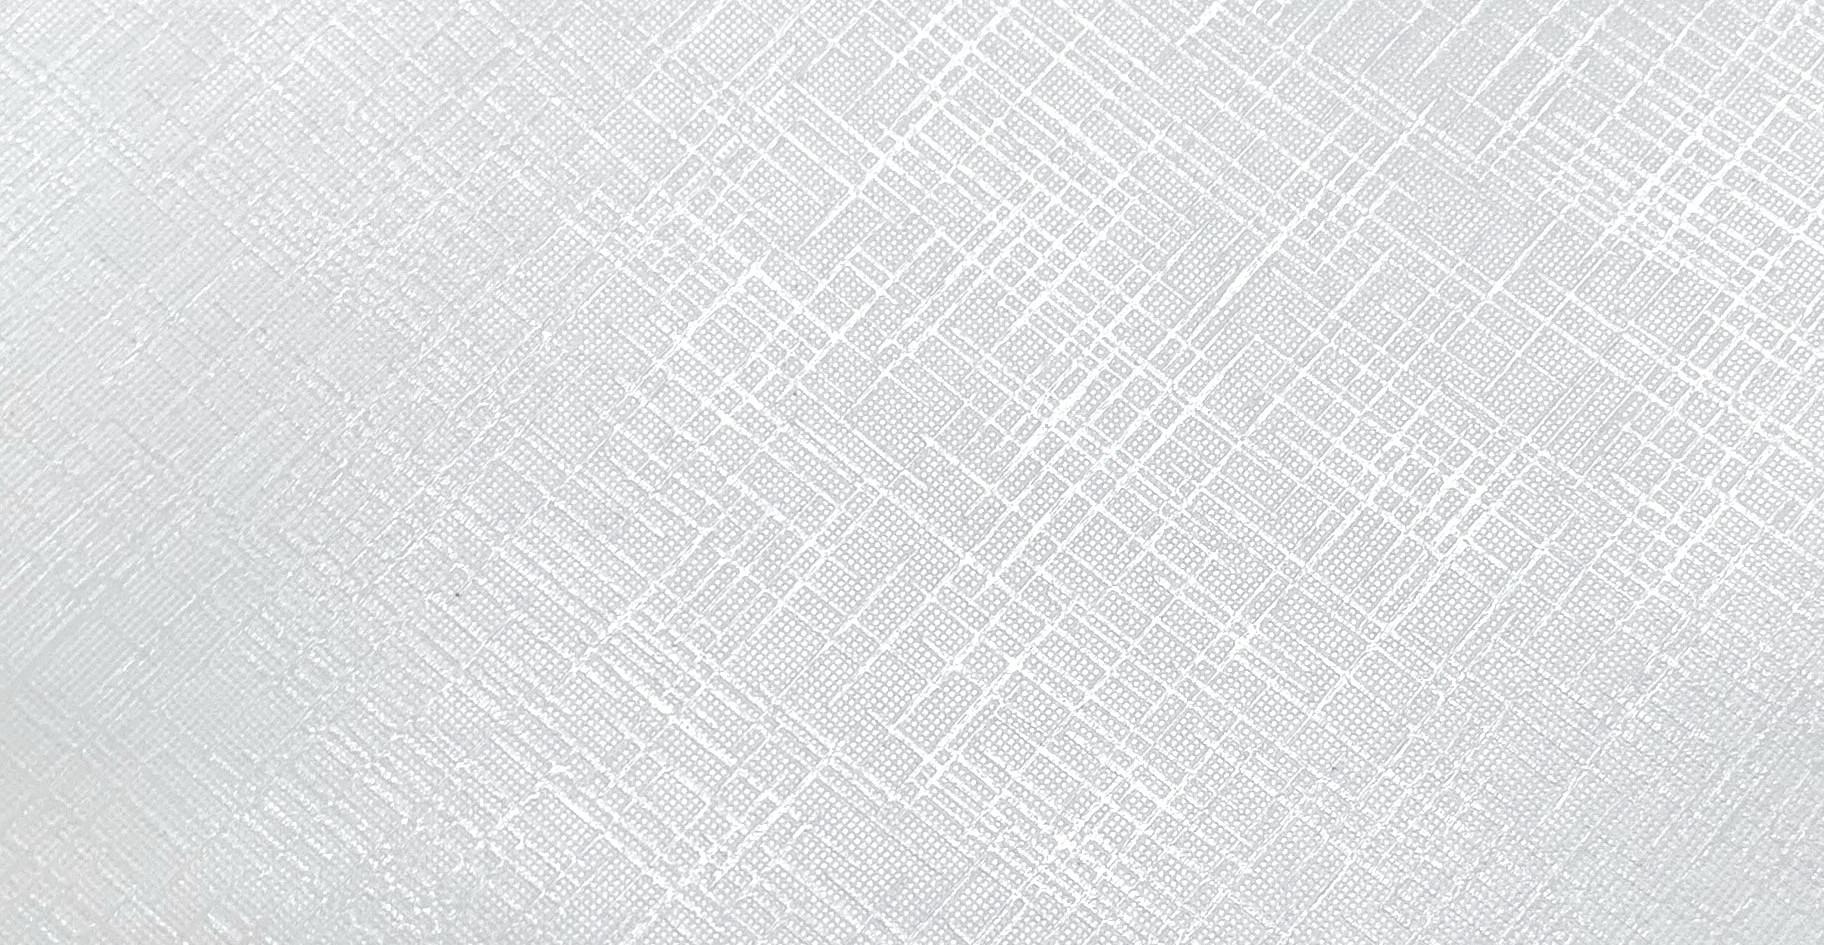 wallpaper telado